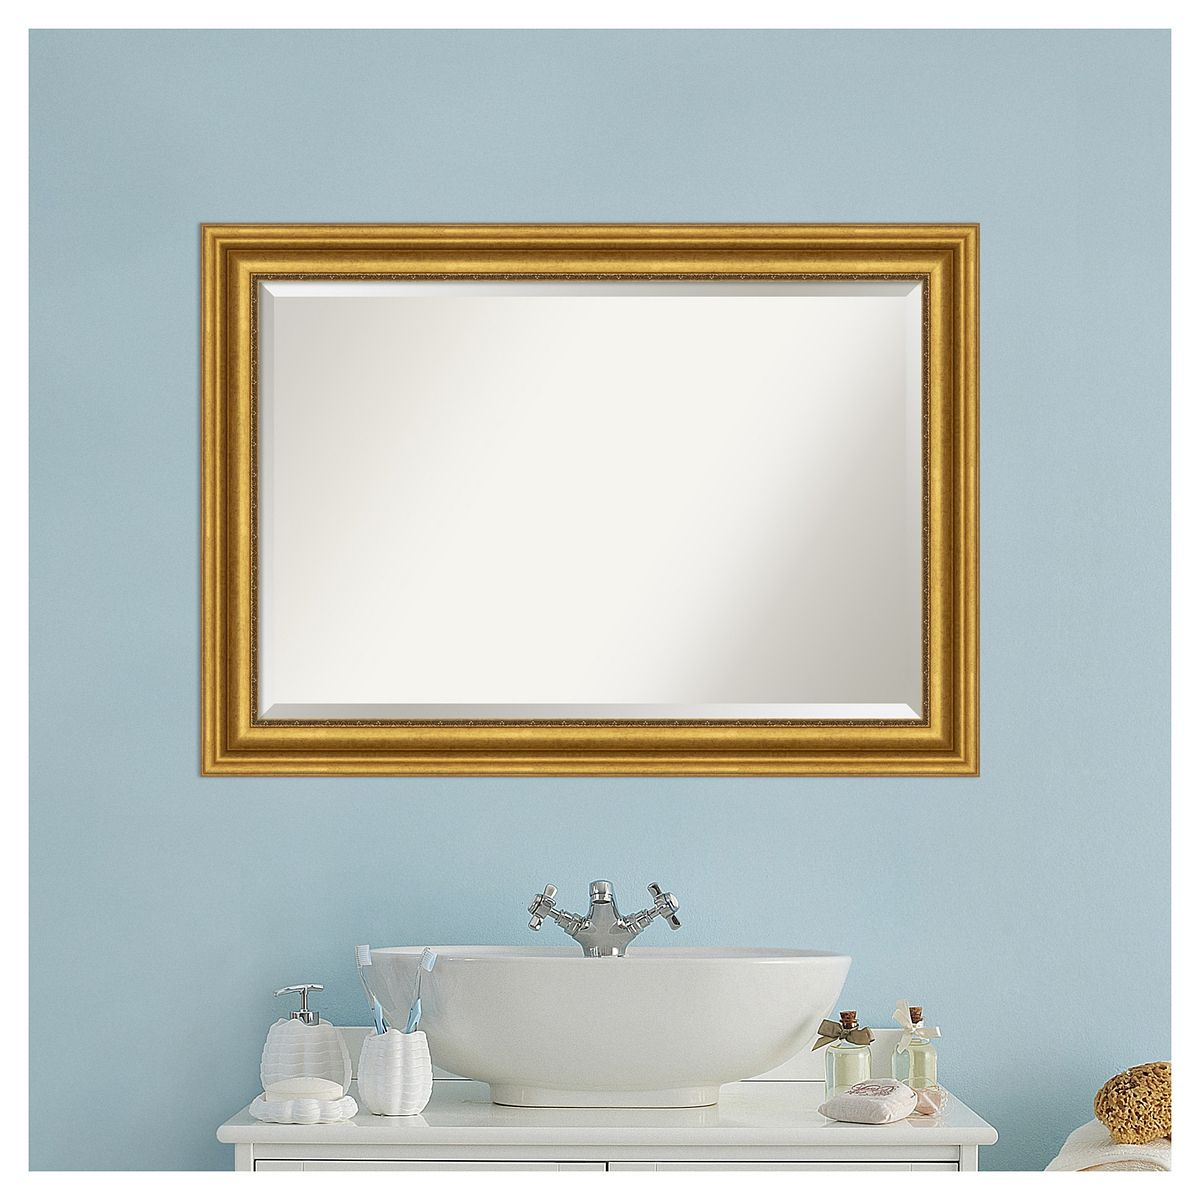 Amanti Art Parlor Gold Bathroom Vanity Wall Mirror C8OqB